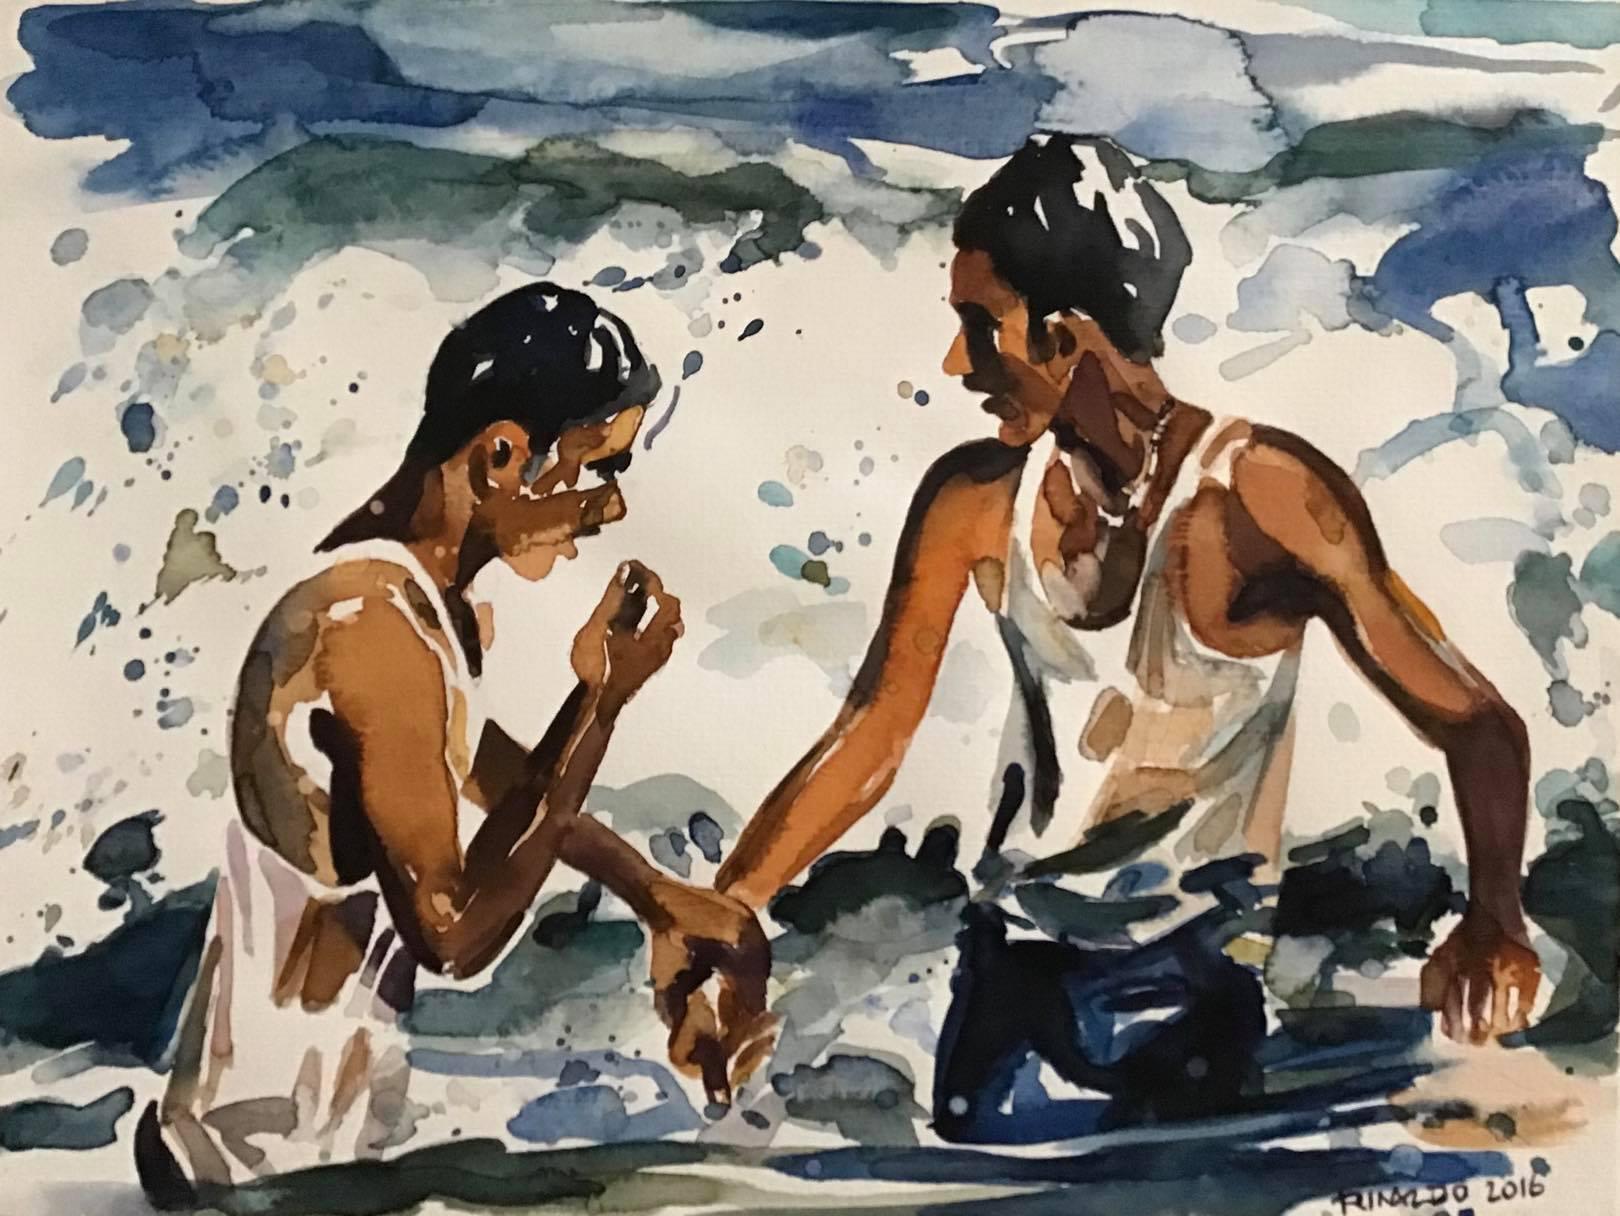 Moonlight Swimmers by Rinaldo Hopf